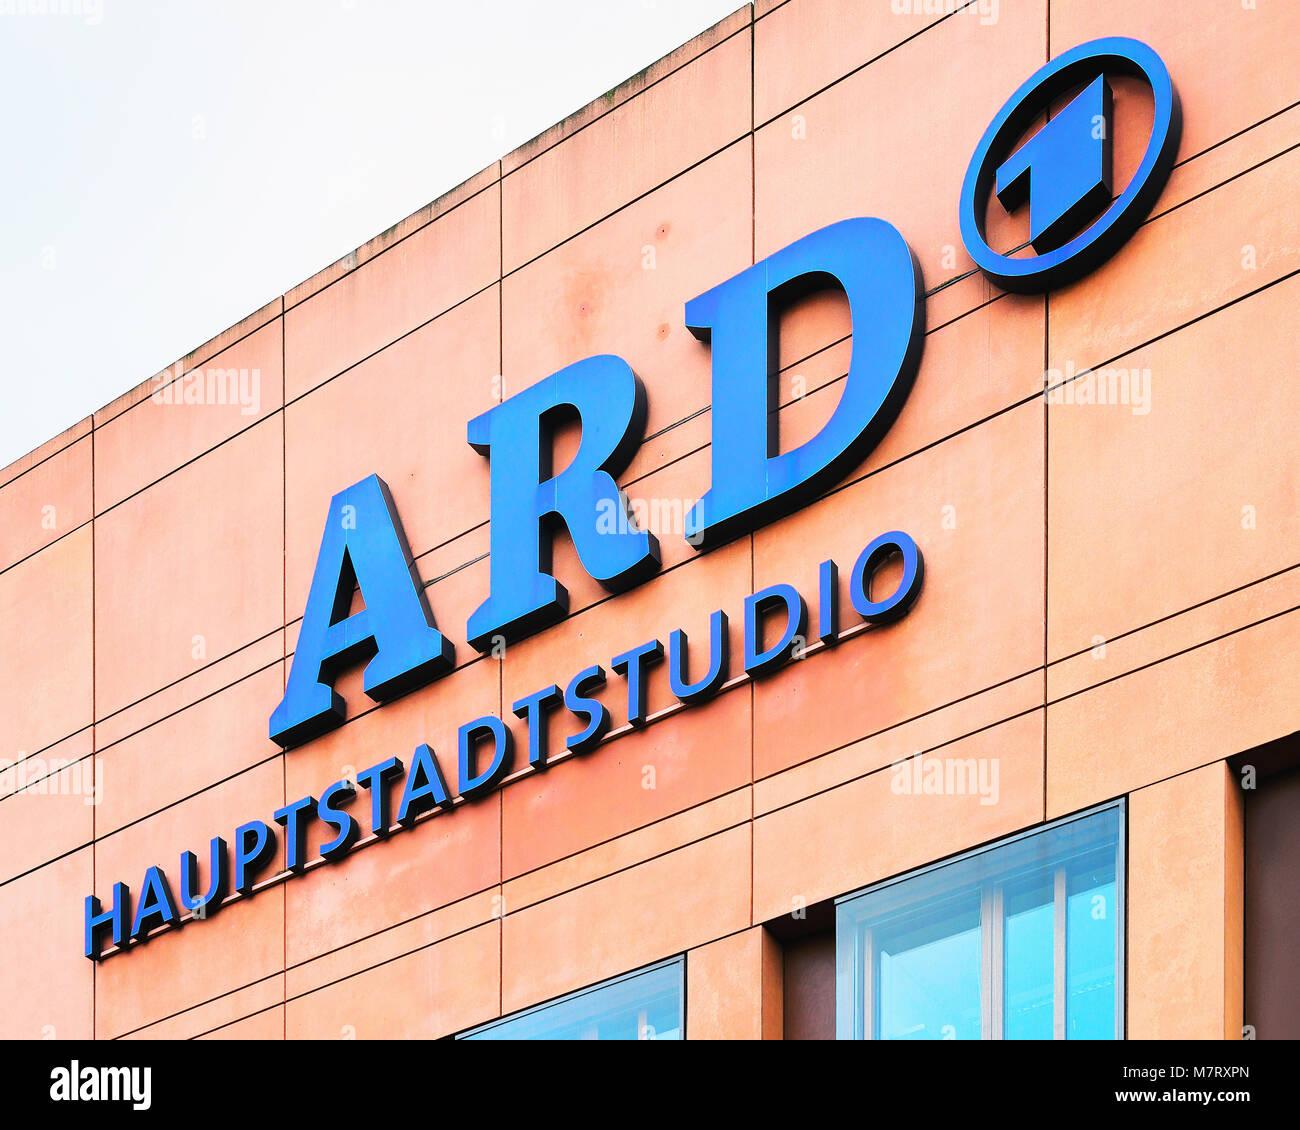 Berlin, Germany - December 8, 2017: Office building of ARD onsortium of public broadcasters in Berlin, Germany Stock Photo